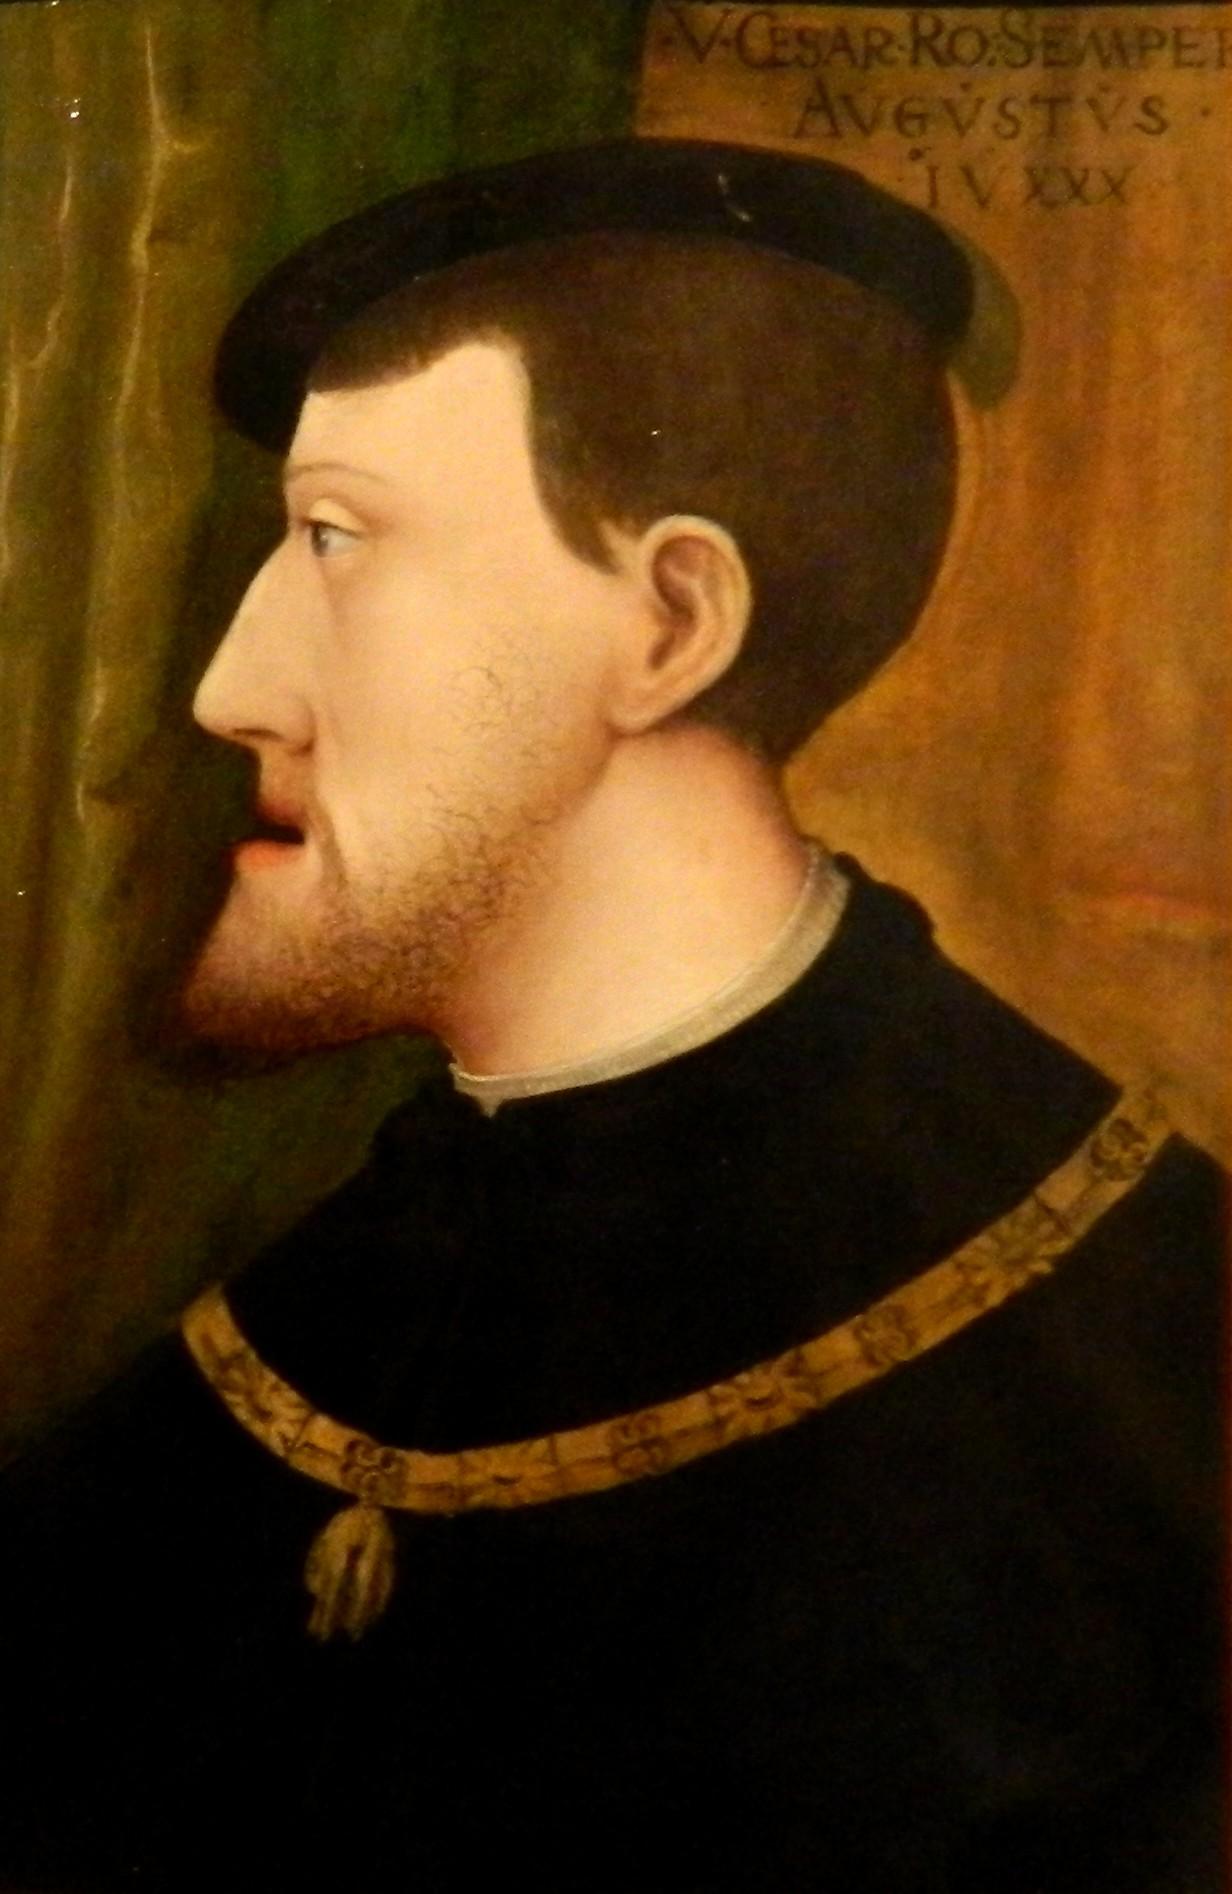 https://upload.wikimedia.org/wikipedia/commons/b/bb/Spanish_artist_-_Portrait_of_Emperor_Charles_V_%28Museum_of_Fine_Arts%2C_Budapest%29.jpg